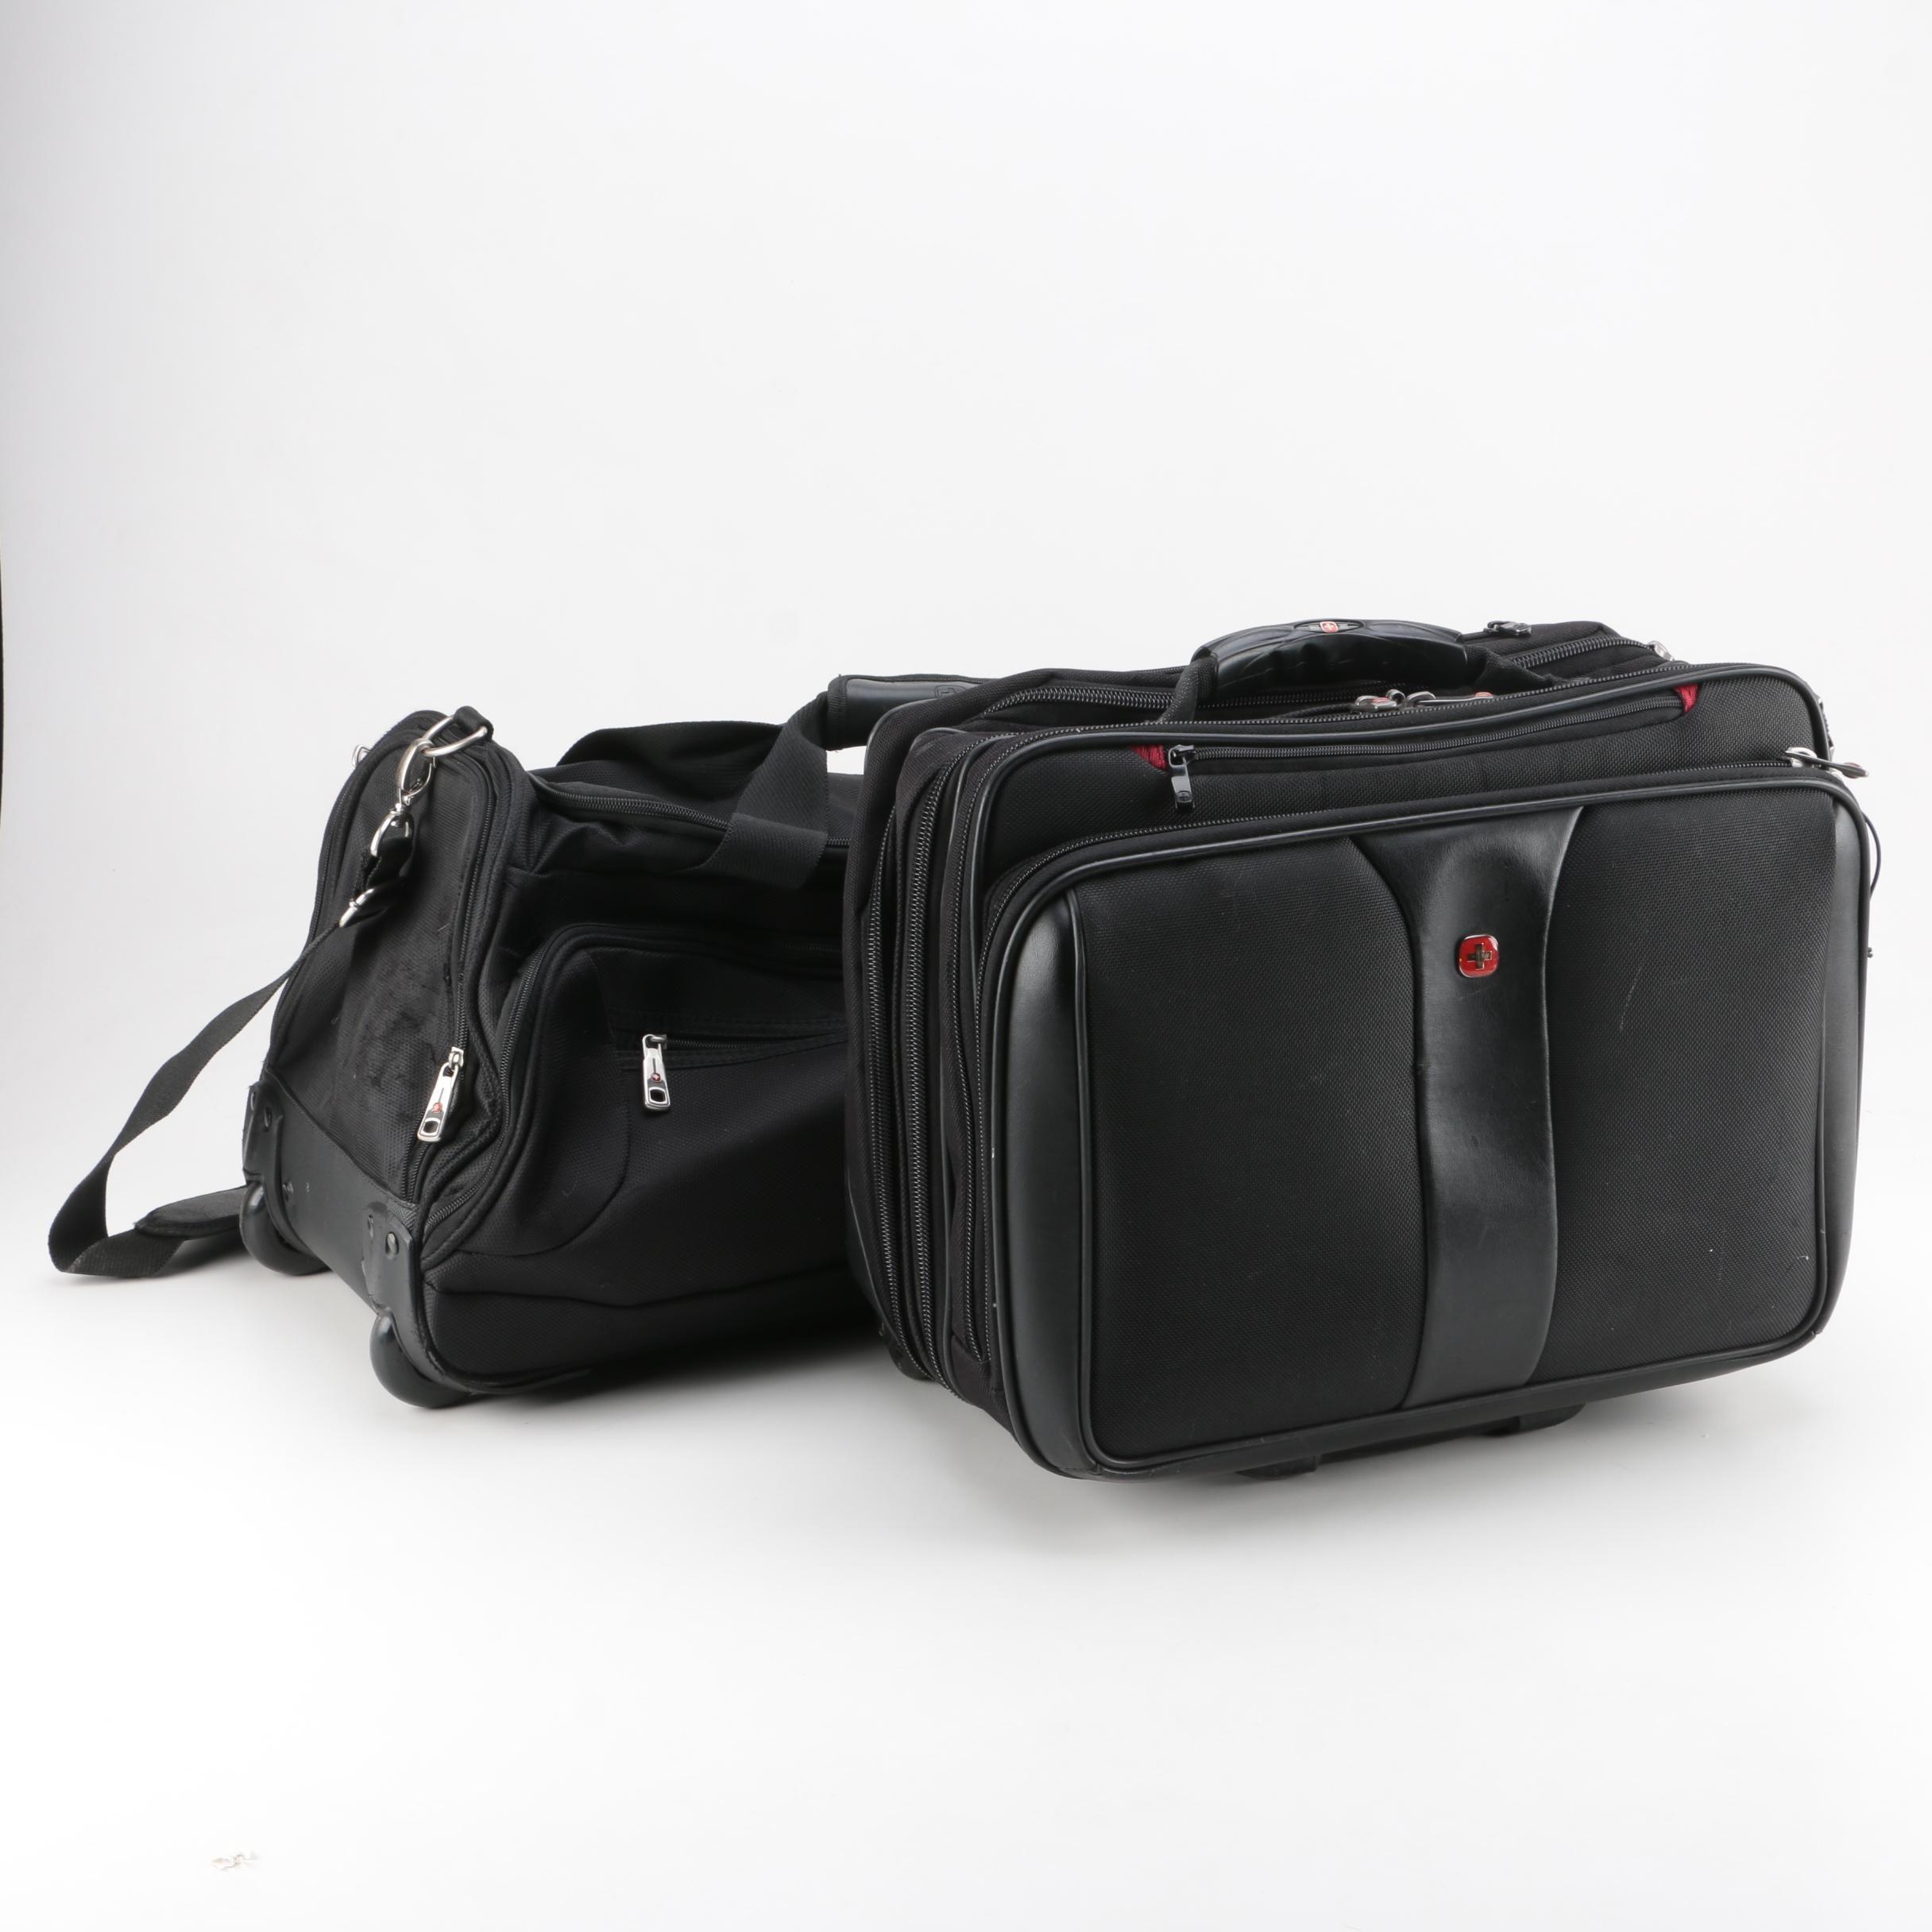 Wenger SwissGear Patriot Luggage